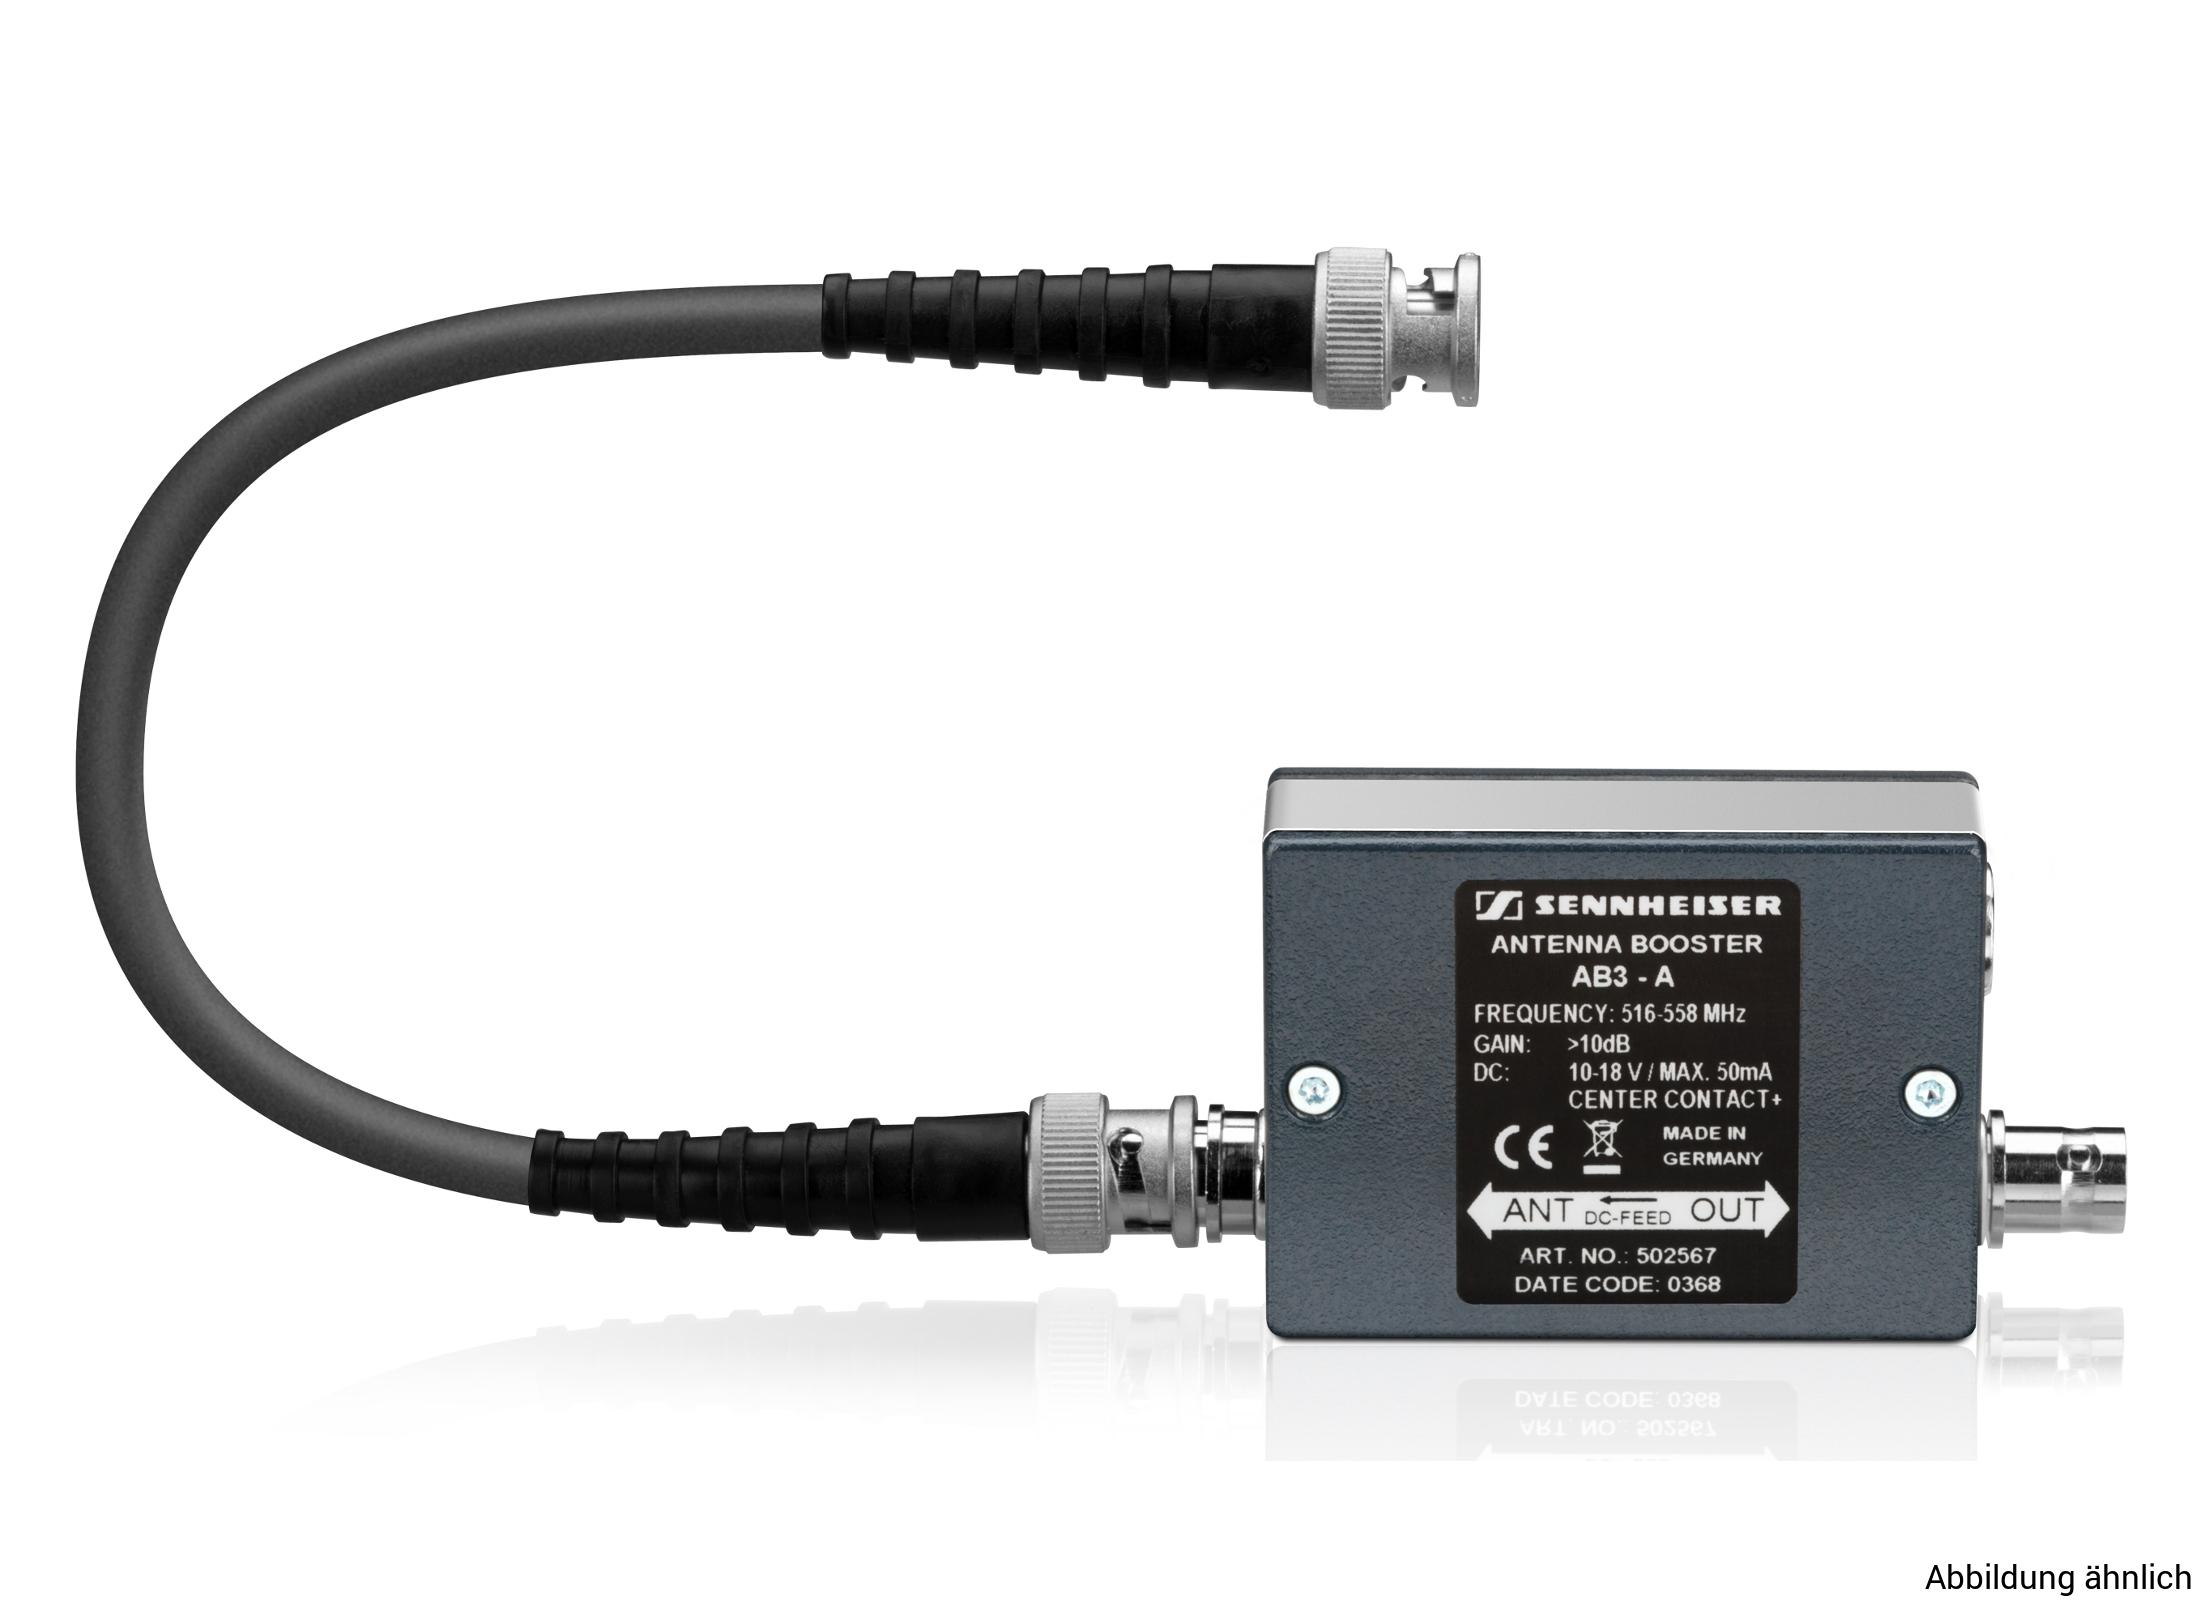 Sennheiser AB 3-E Antennenverstärker Booster günstig online kaufen ...